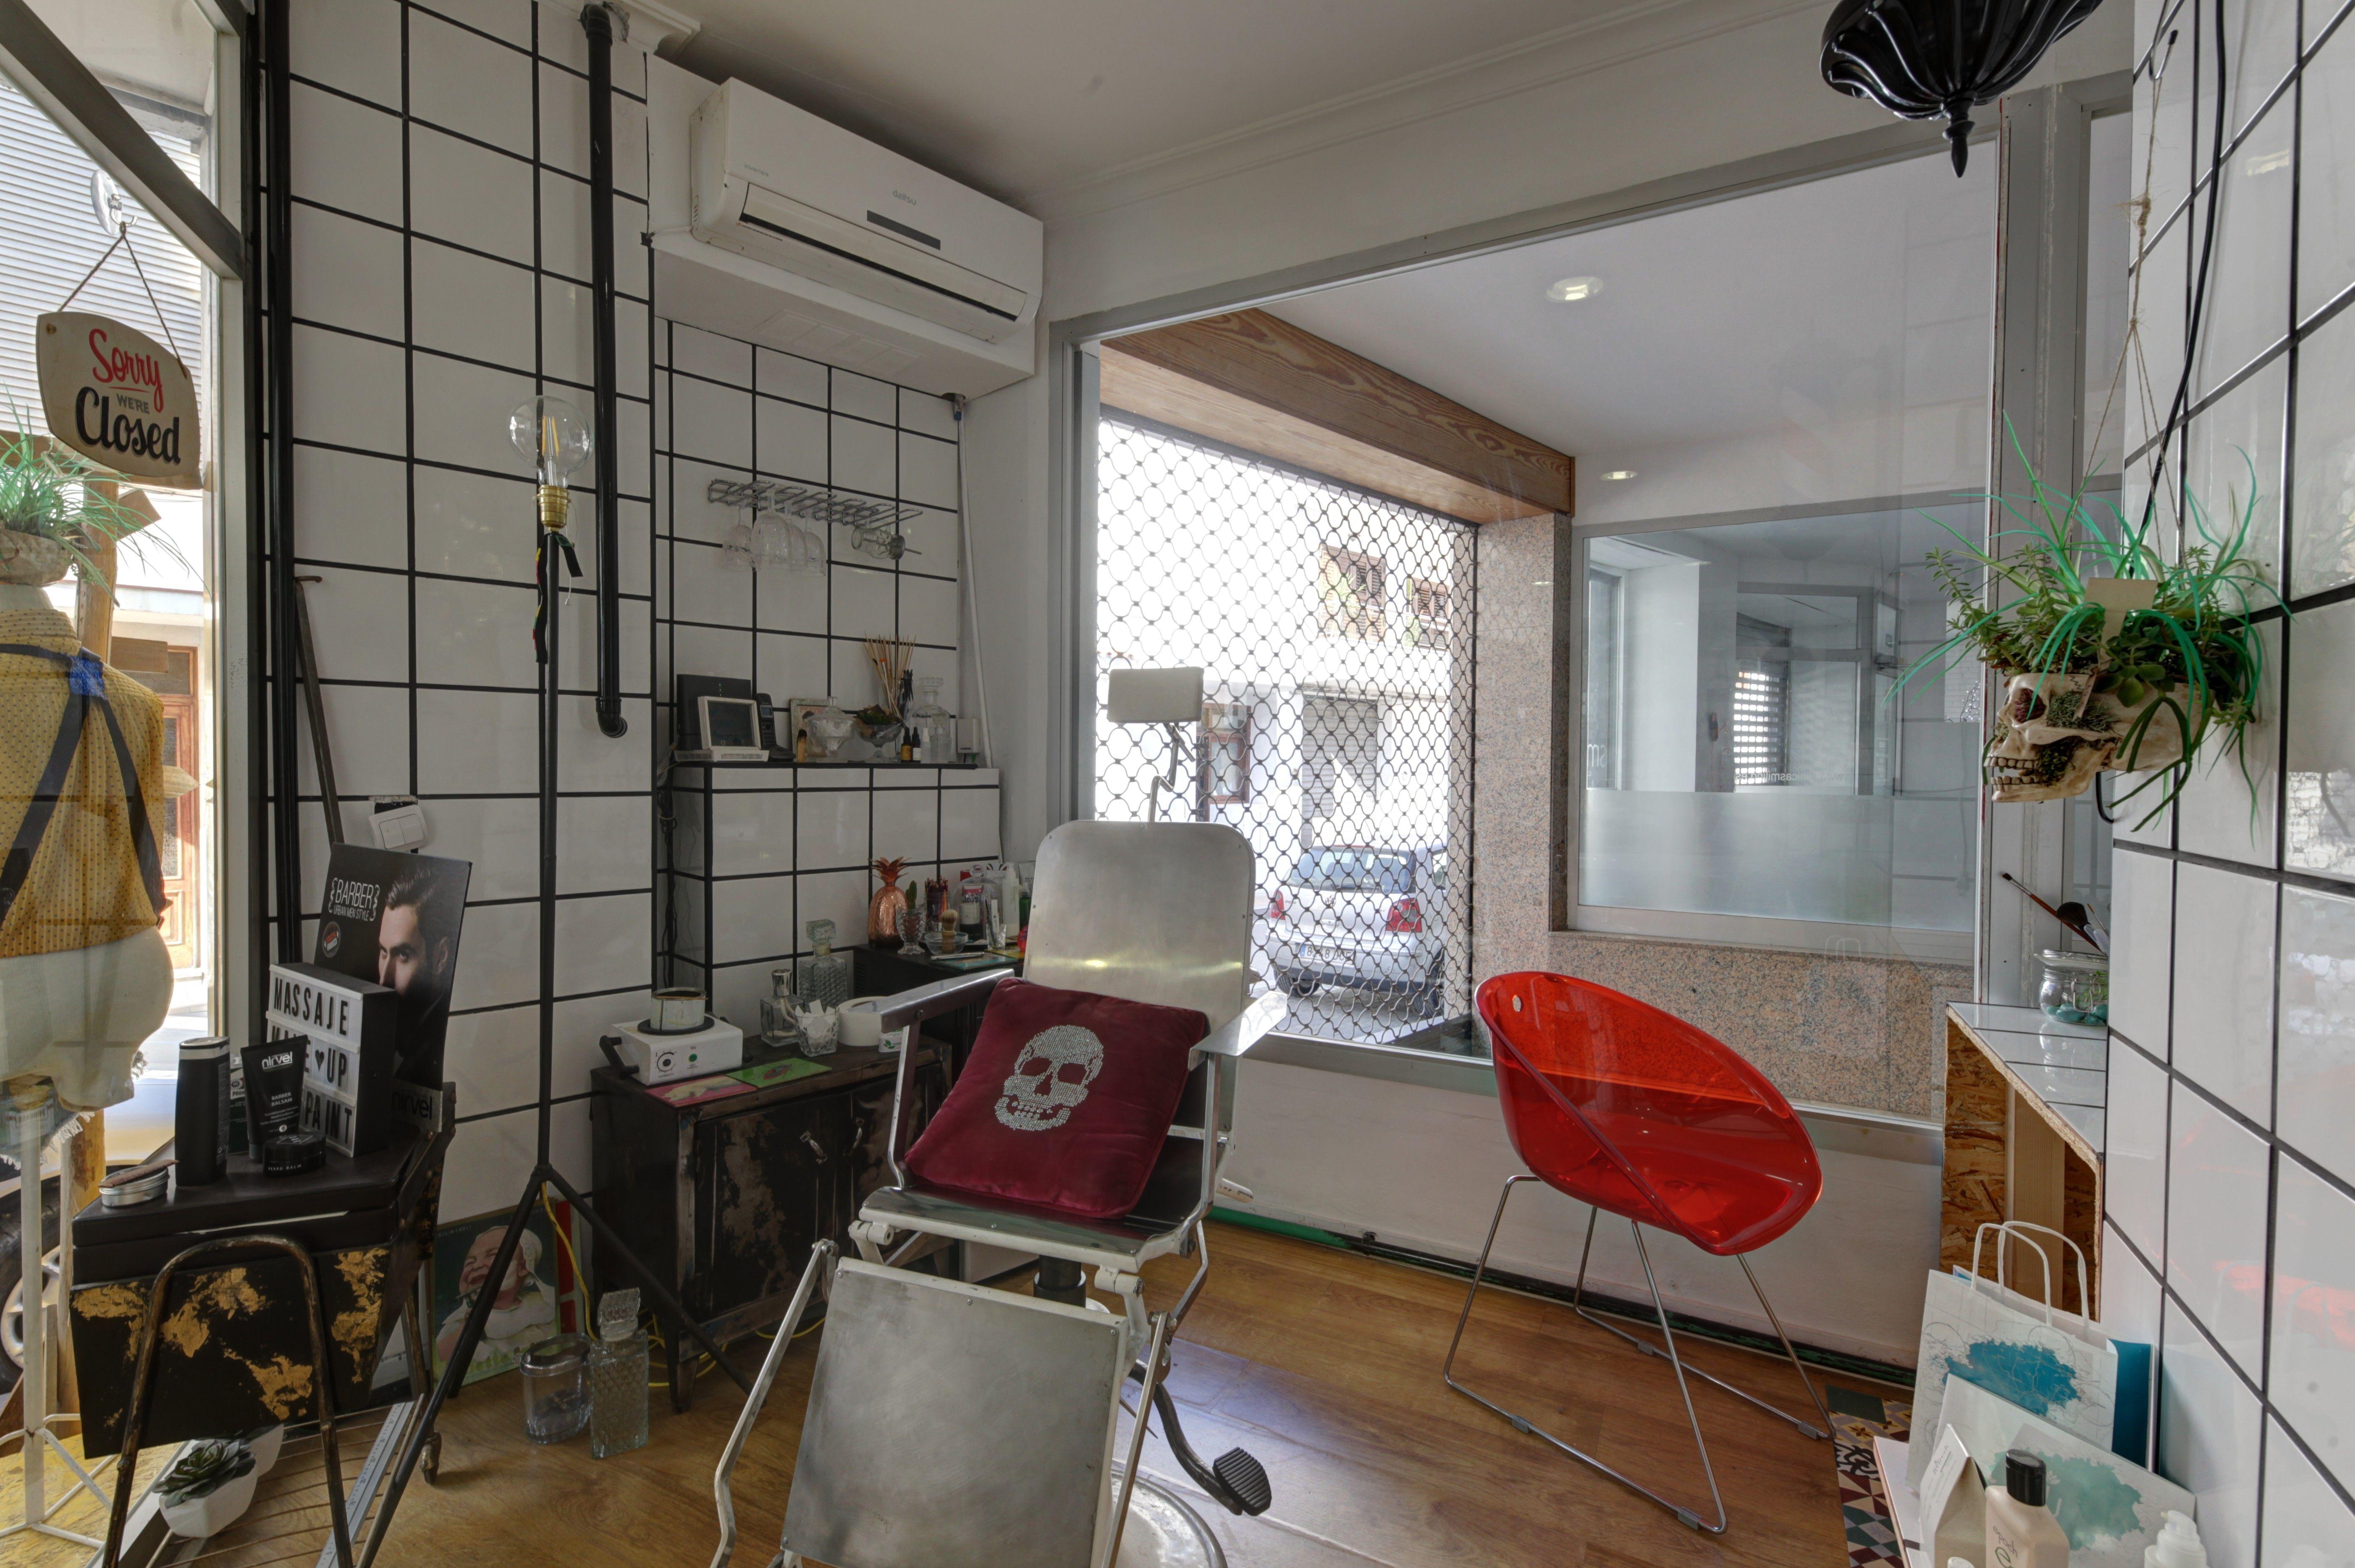 Foto 3 de Hair salons en Sant Antoni de Portmany | Estudio de Laso